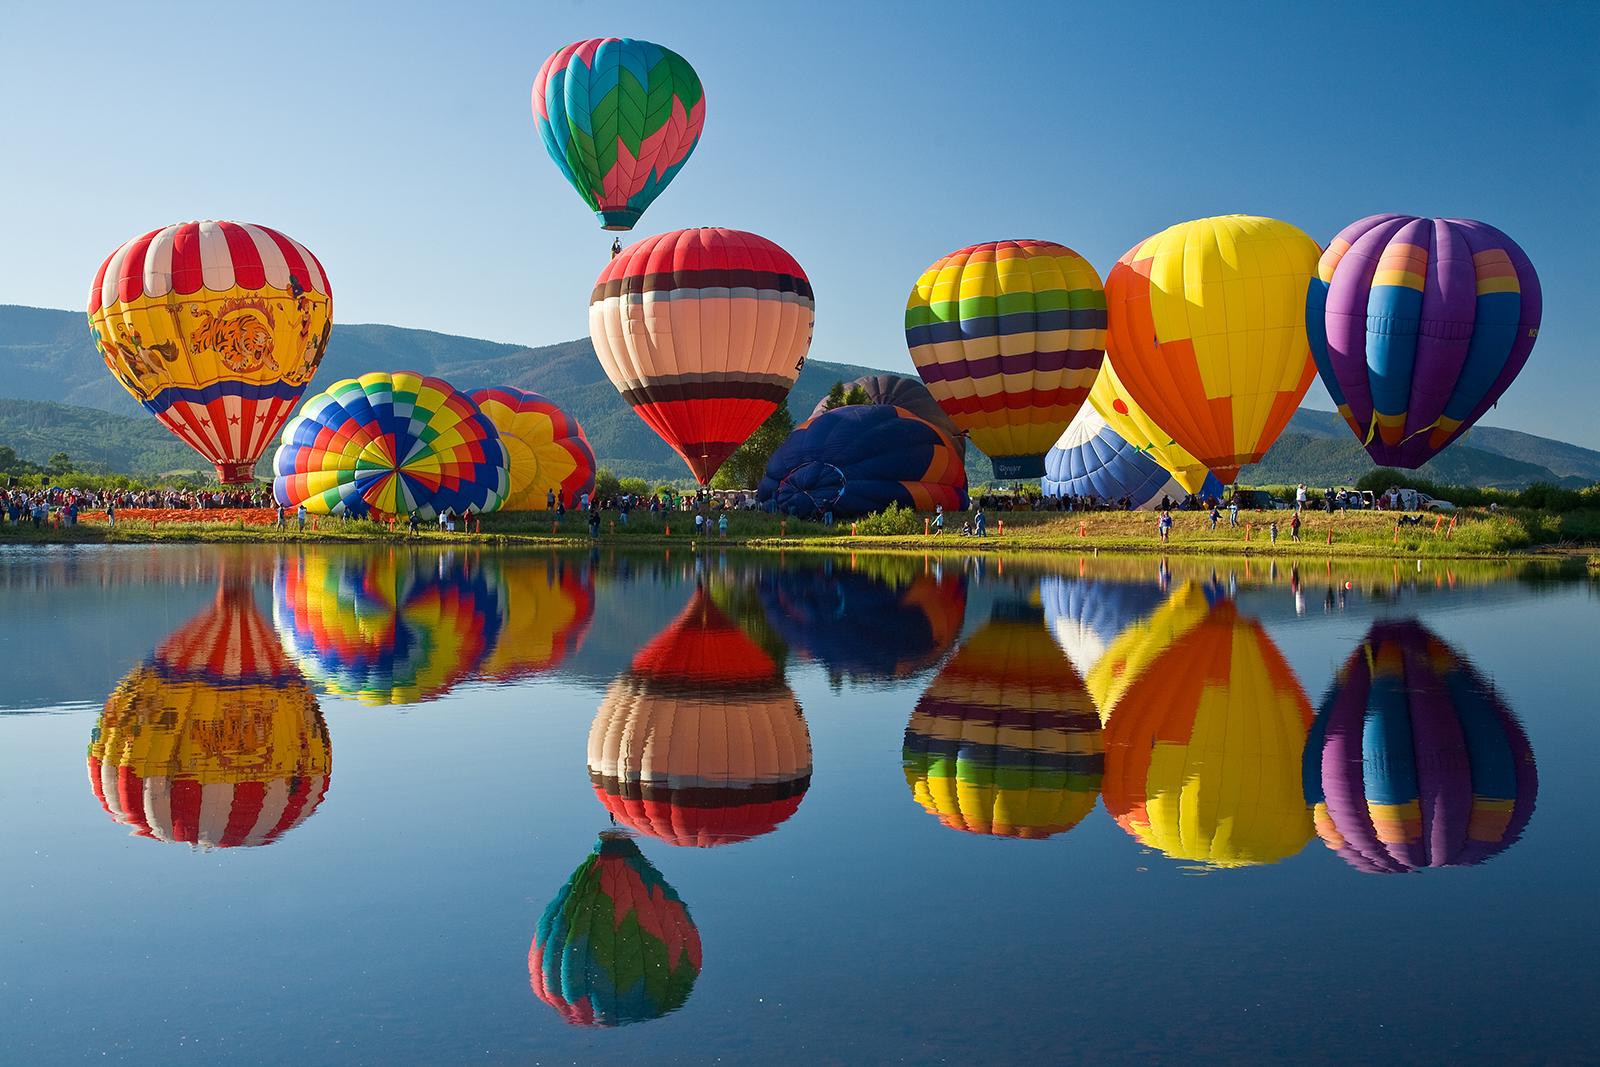 ck_Balloon rodeo 1.jpg